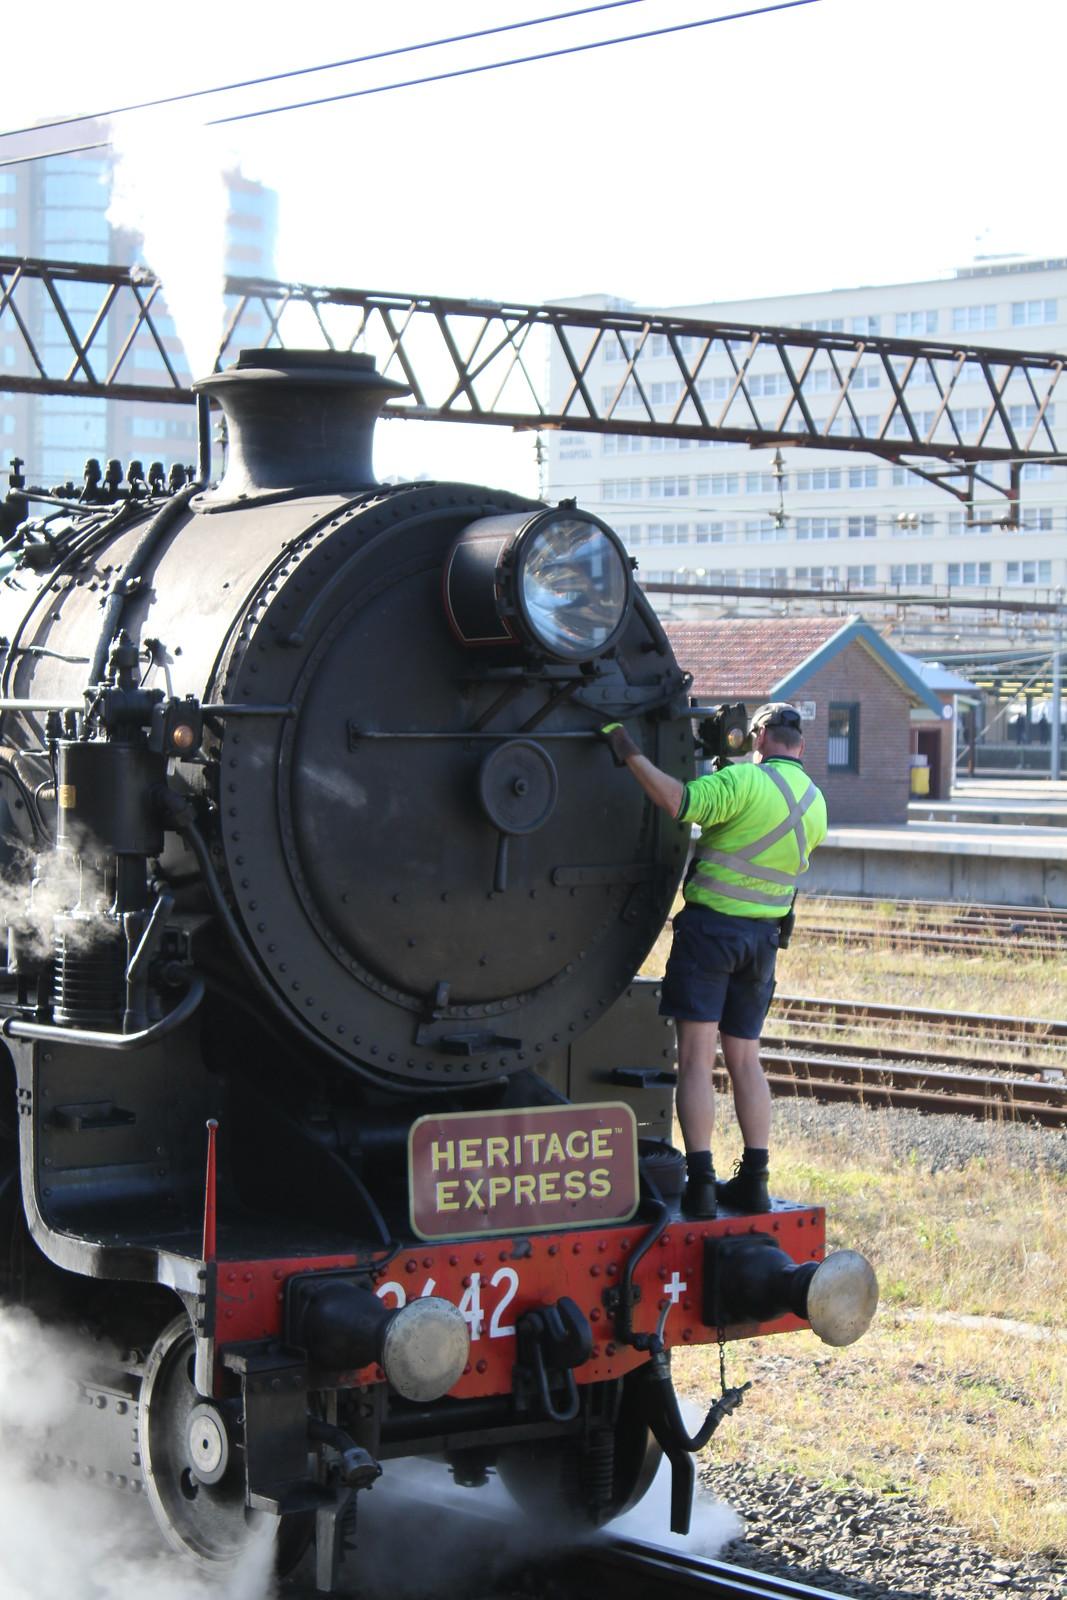 Sydney Great Train Expo 2012. 9/6/12 Ref IMG_7D5062 by Matthew Monty